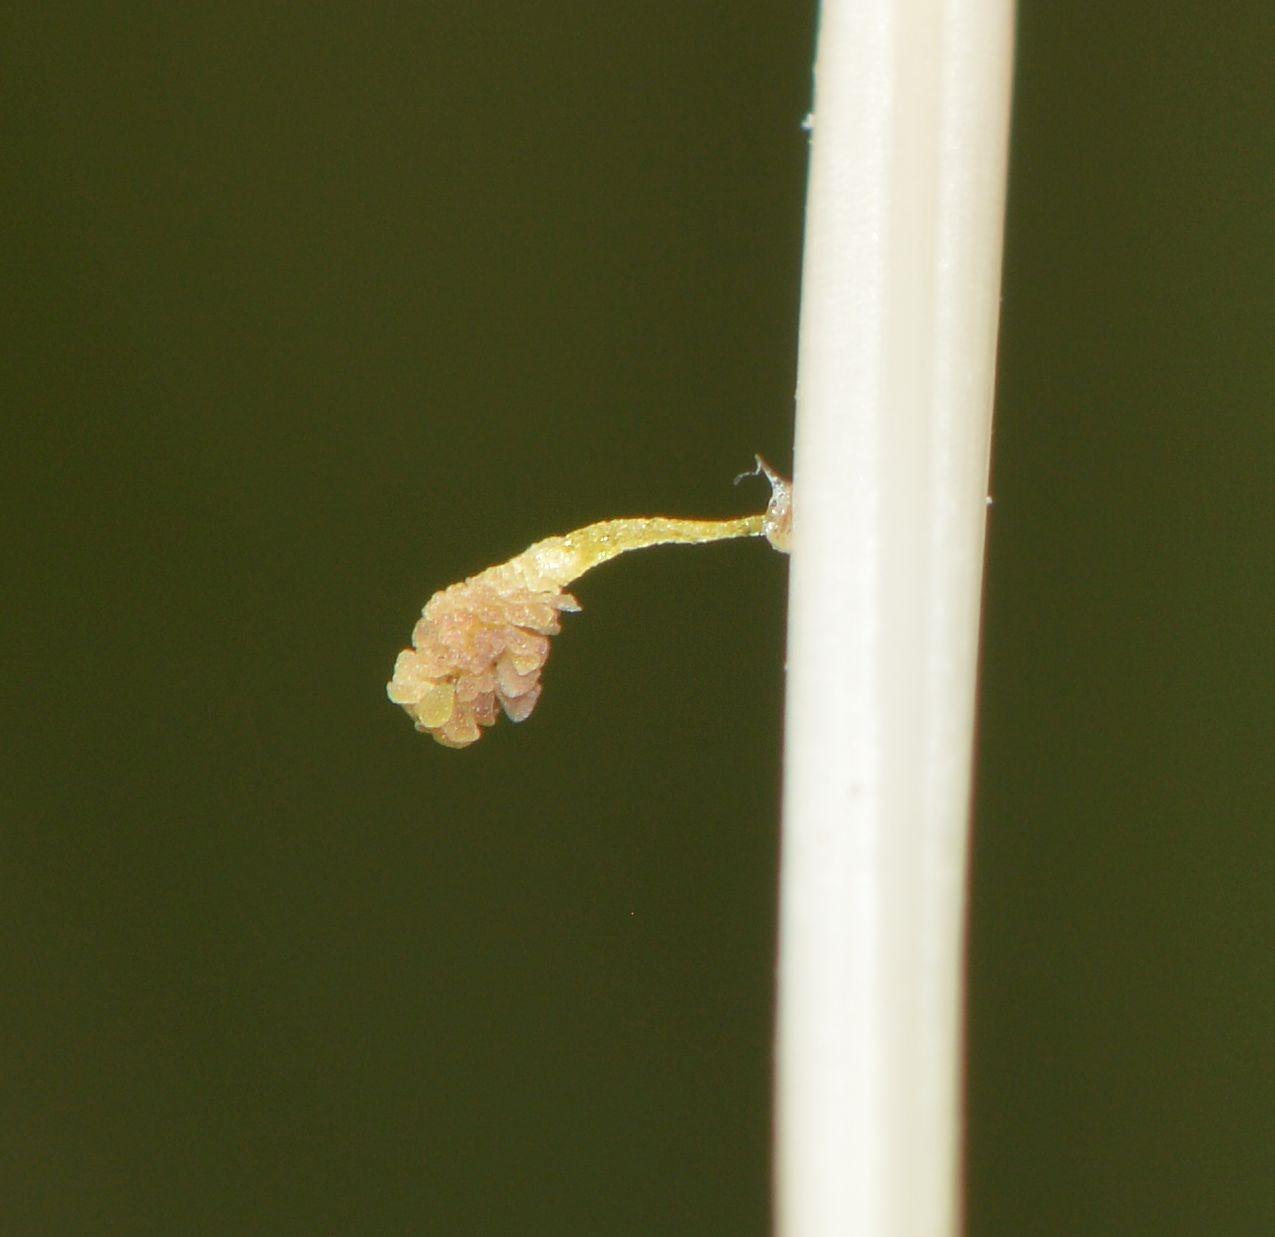 Foto/billede af Plettet Gøgeurt (Dactylorhiza maculata ssp. maculata)